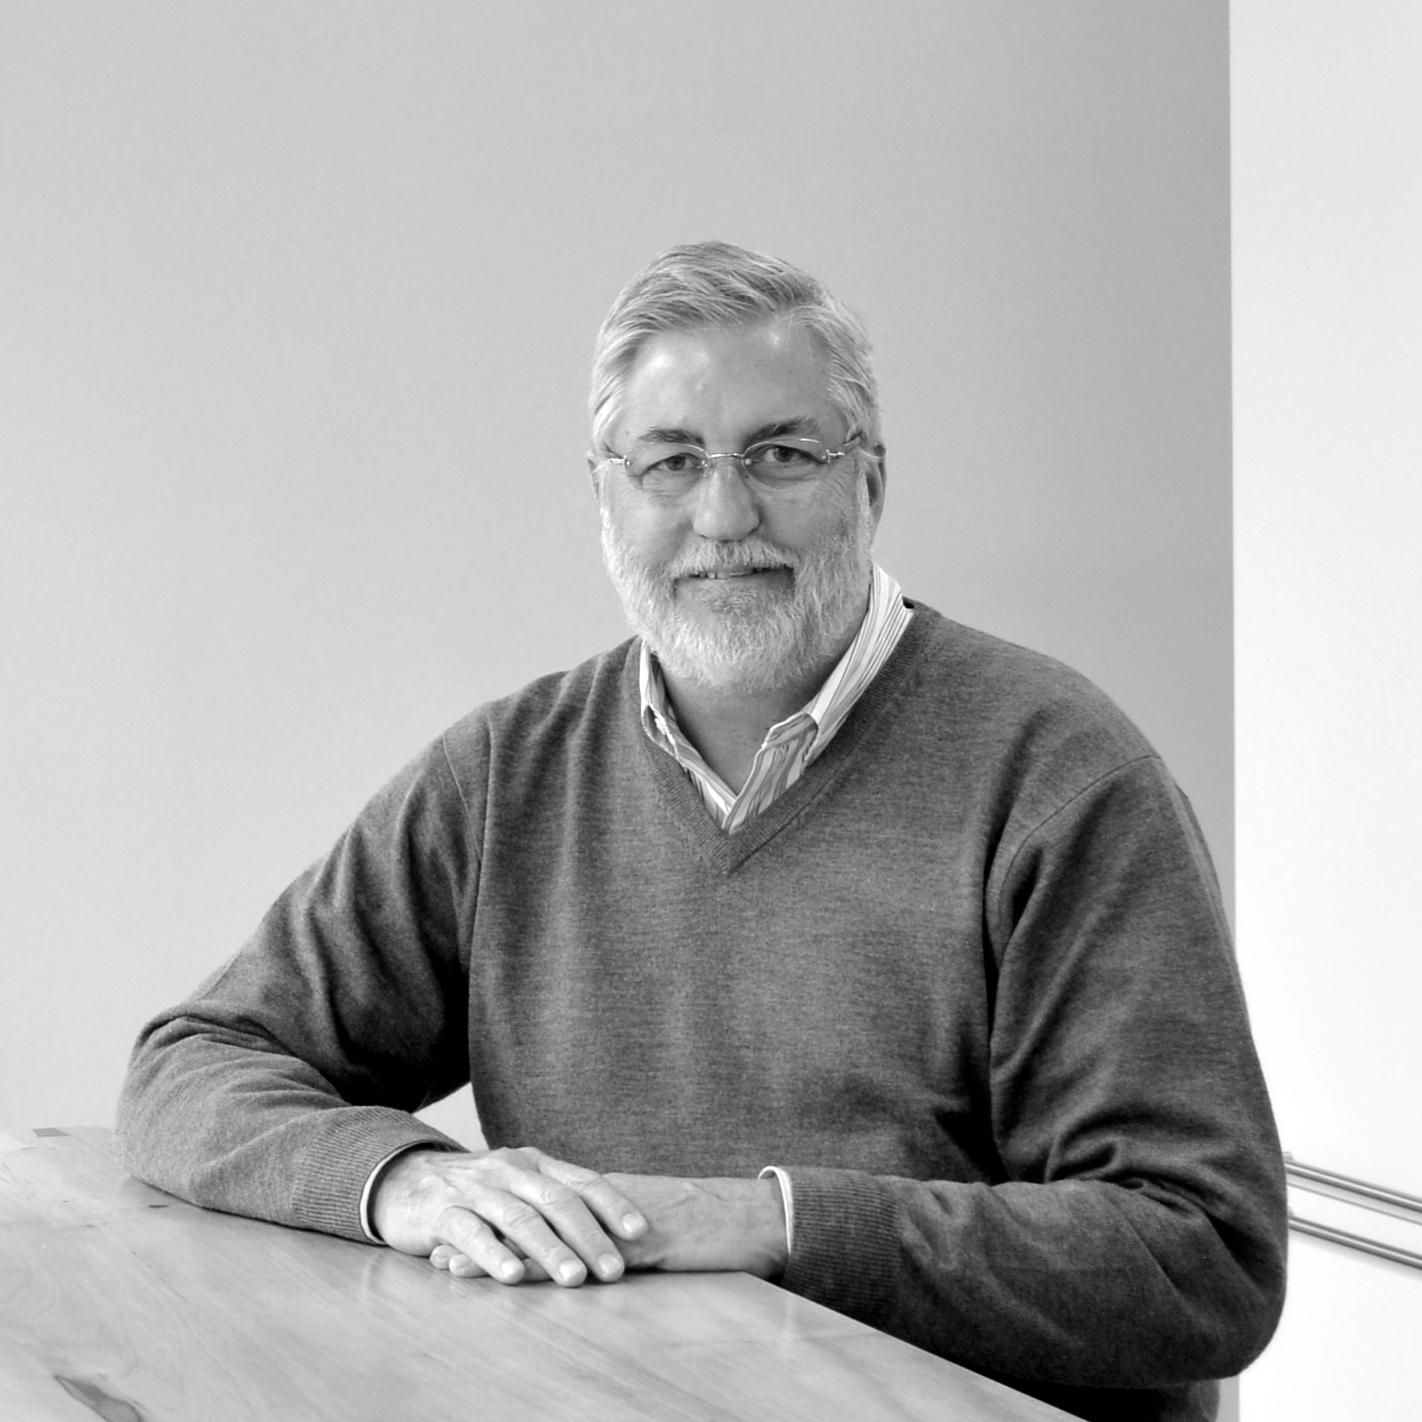 Roger Godwin, AIA, LEED AP